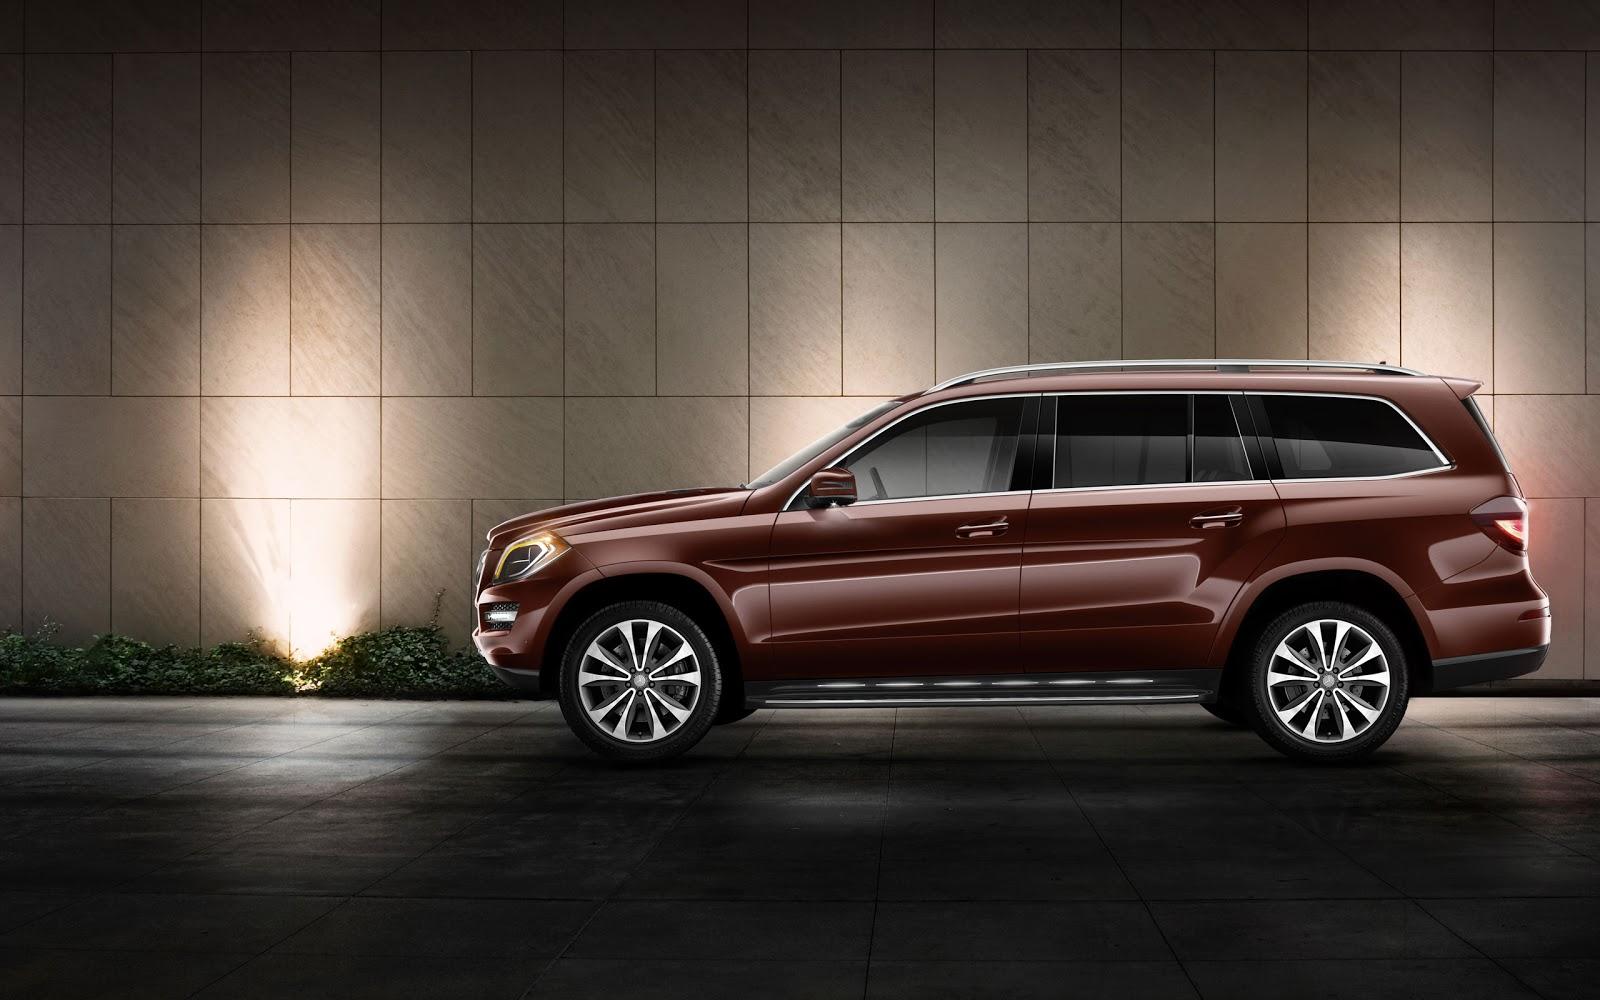 http://3.bp.blogspot.com/-yUaxzEGjqqc/UJ72MaakQsI/AAAAAAAAH1c/2dbtPNbbXT4/s1600/GL-Class-2013-Mercedes+Benz-SUV-Exterior--side-+view-red.jpg